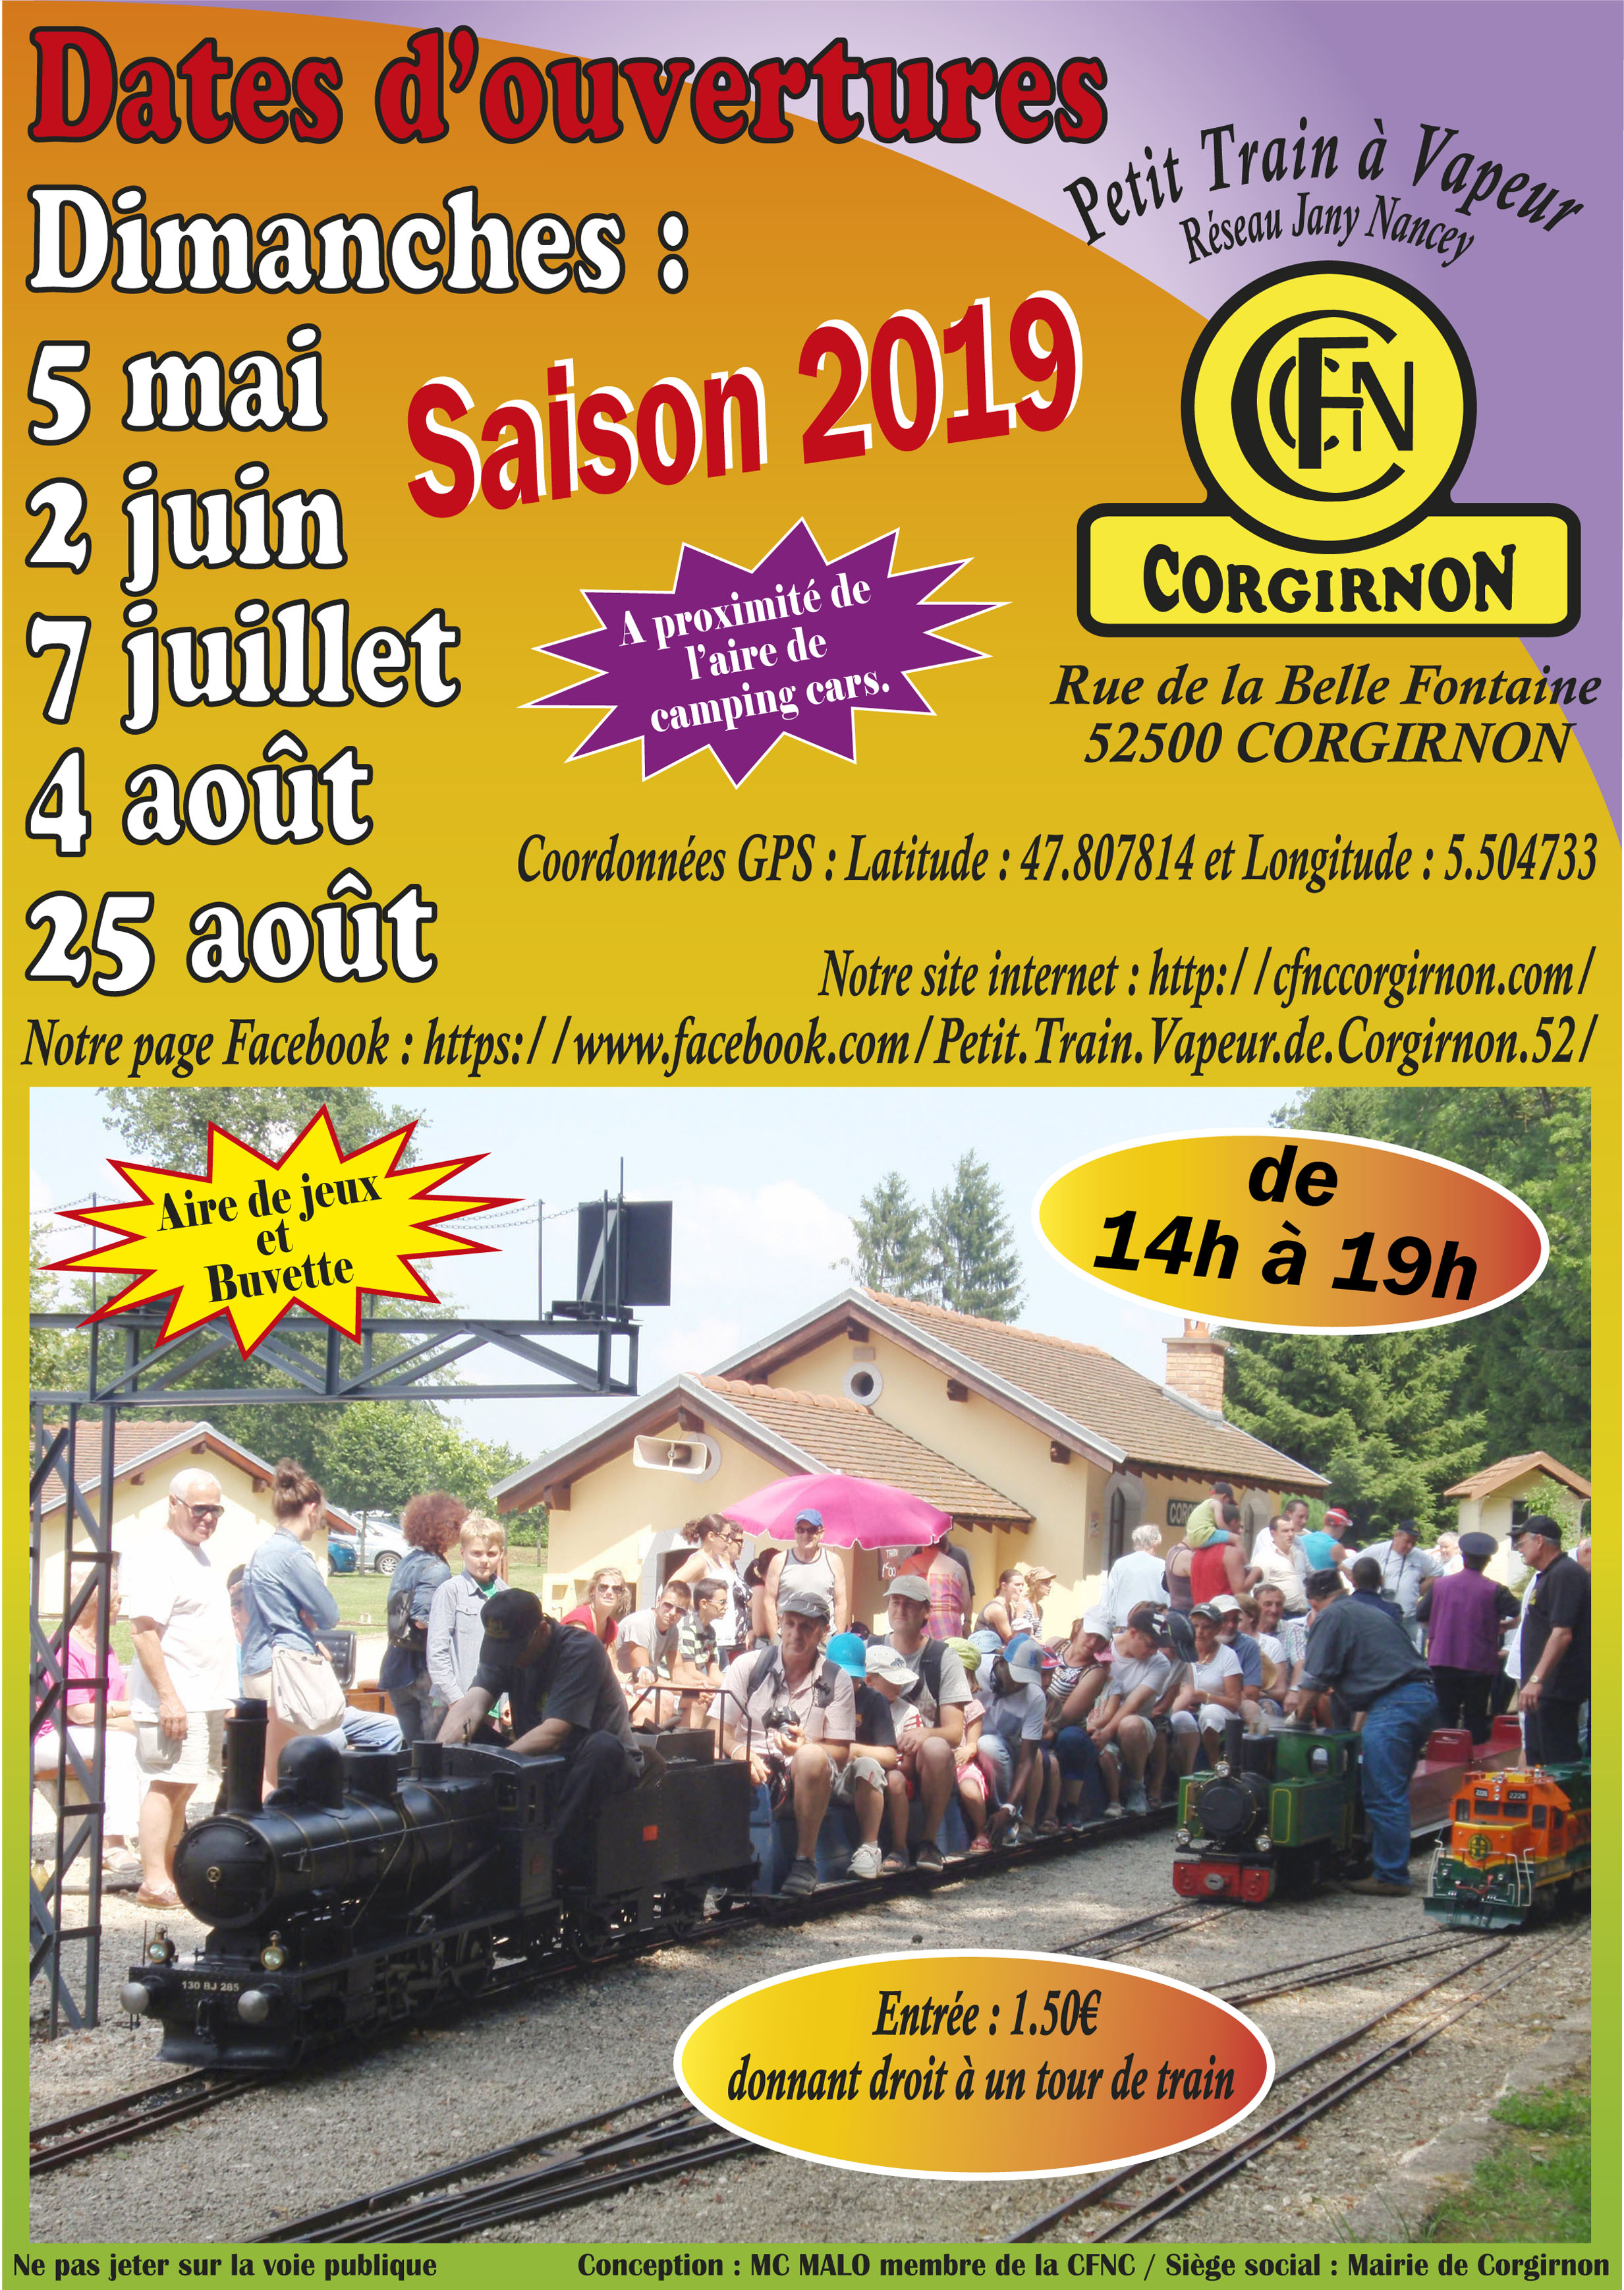 Dates Saison 2019